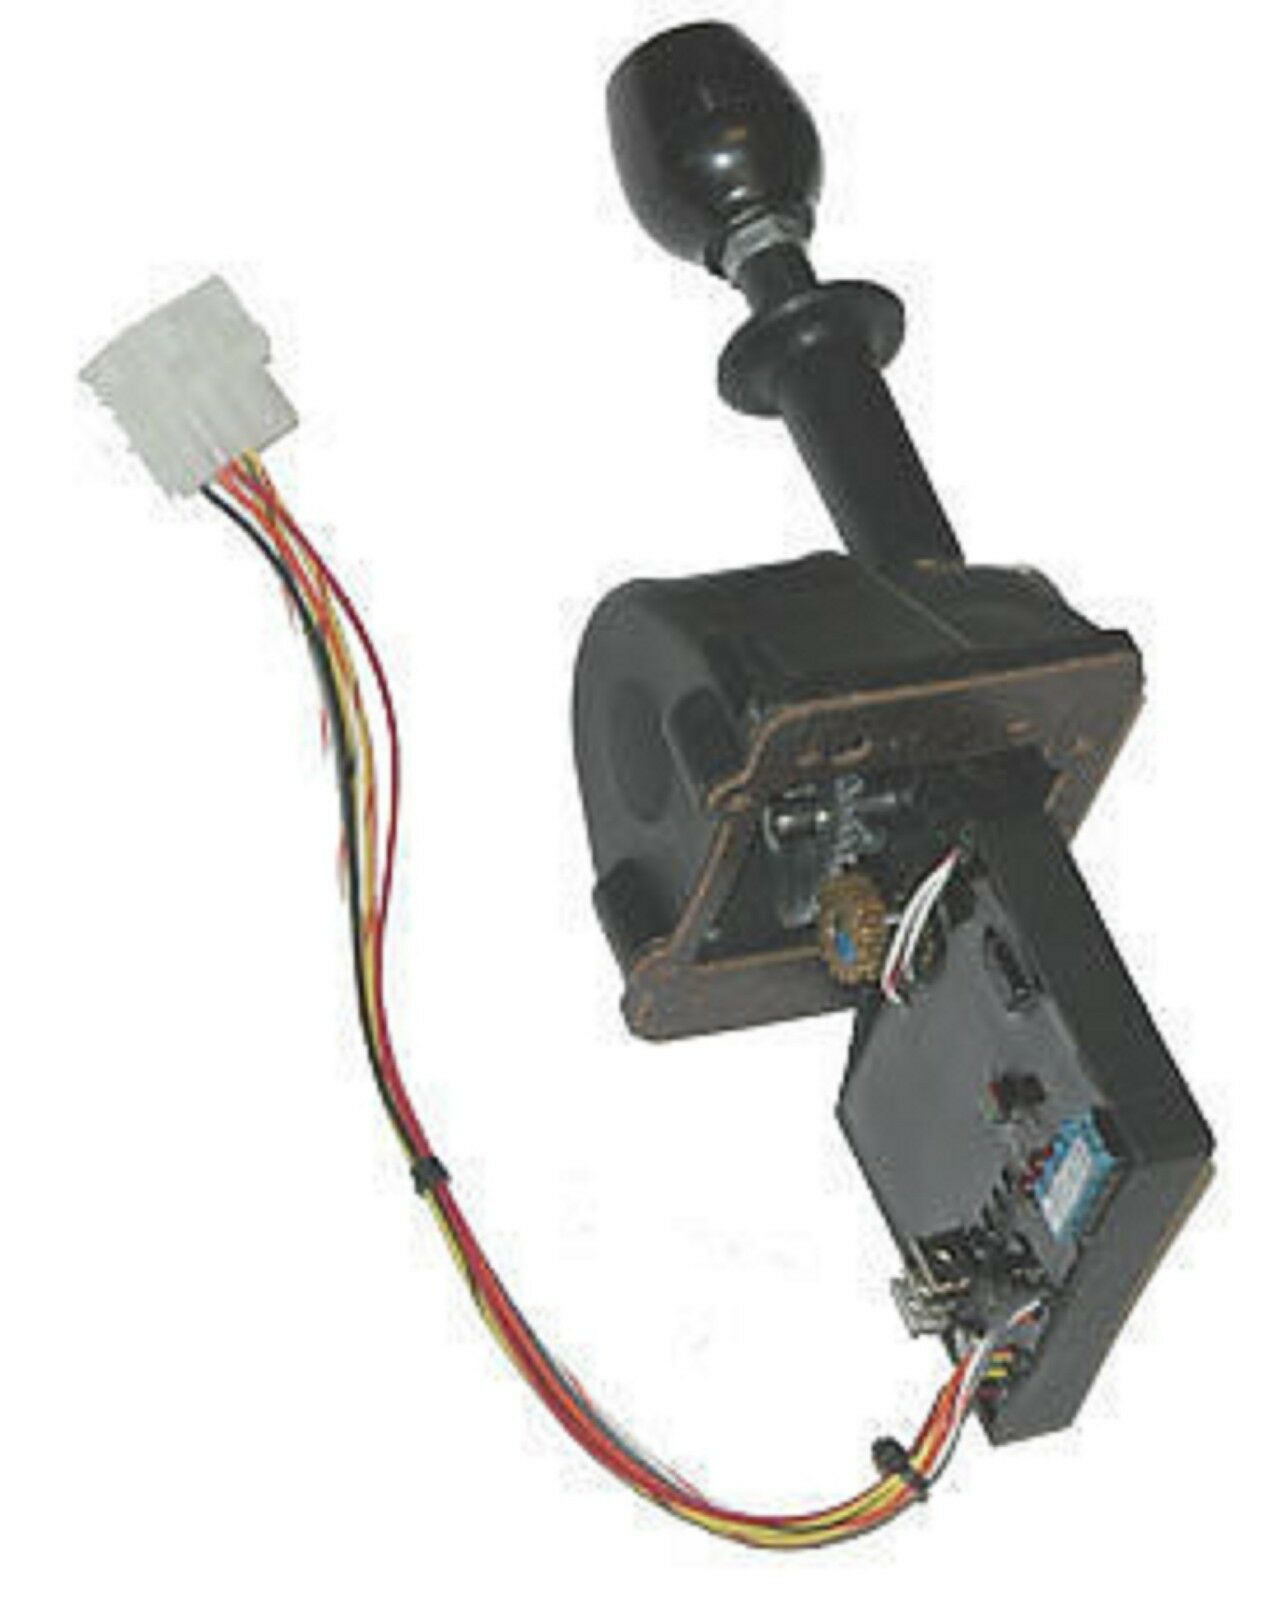 JLG Joystick Controller M120 Style 1600116 Parts Aerial | eBay